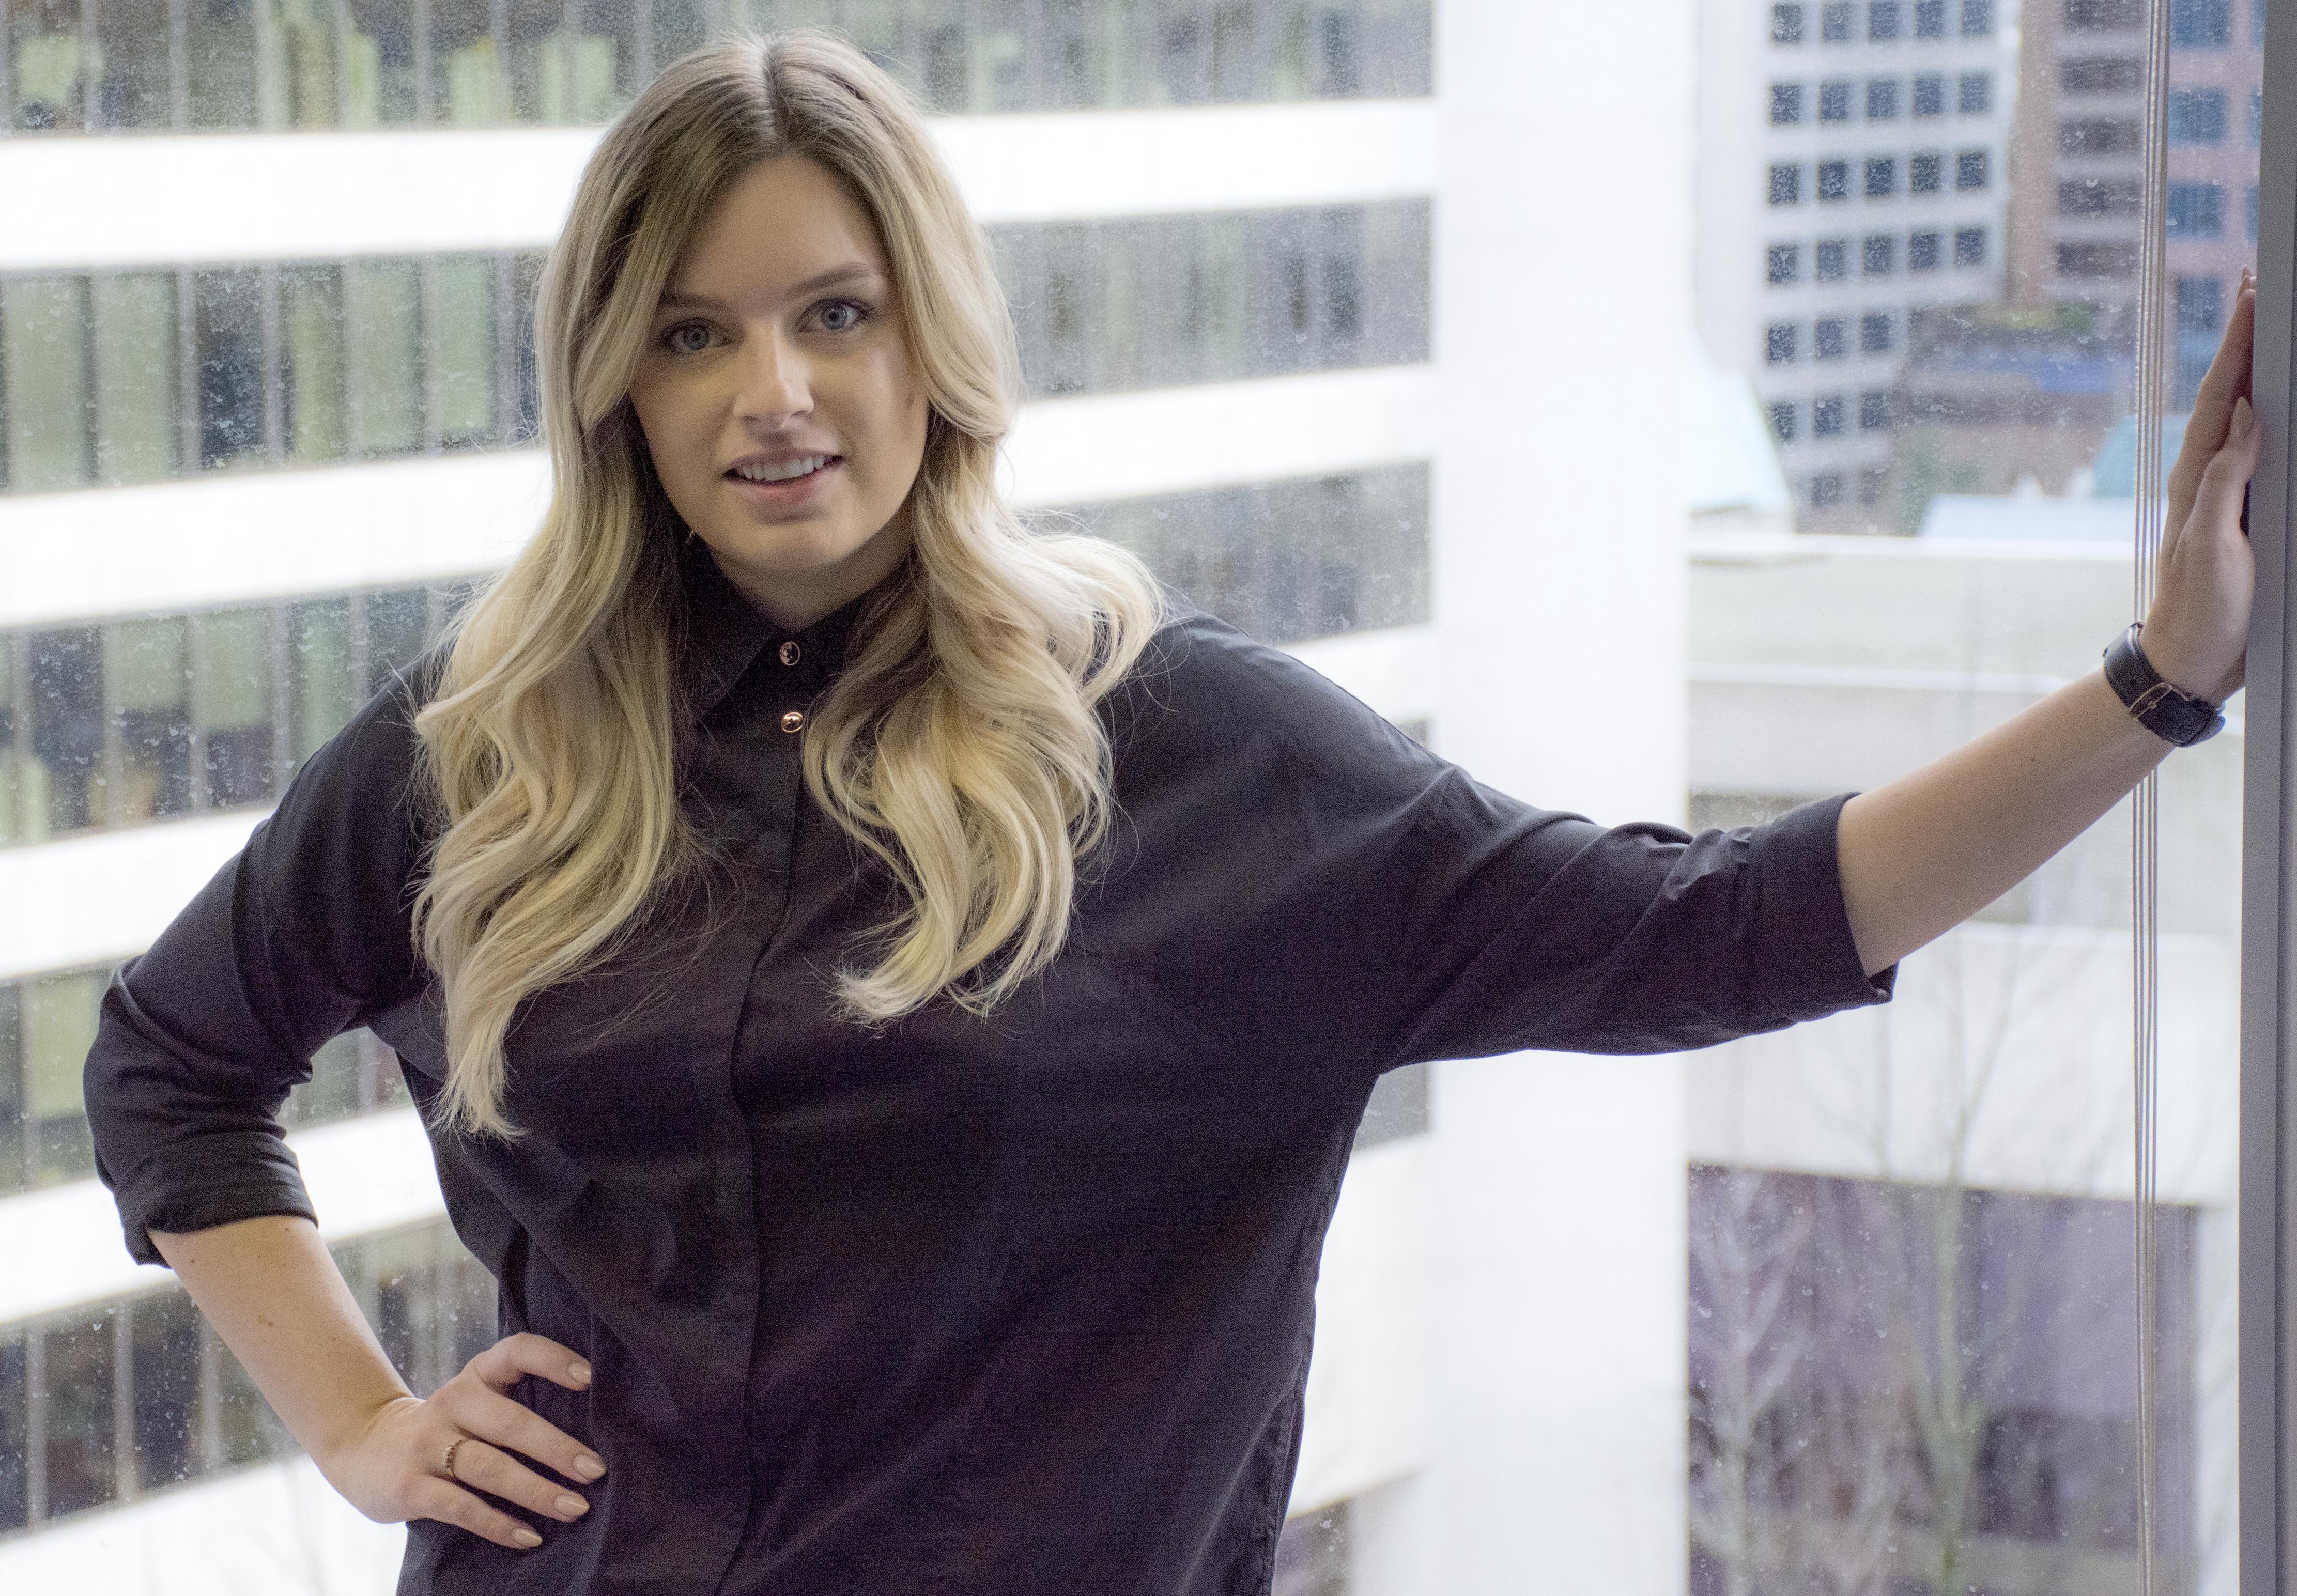 VIDEO: Alumnus & Entrepreneur Transforms BBA Thesis into Fashion Brand